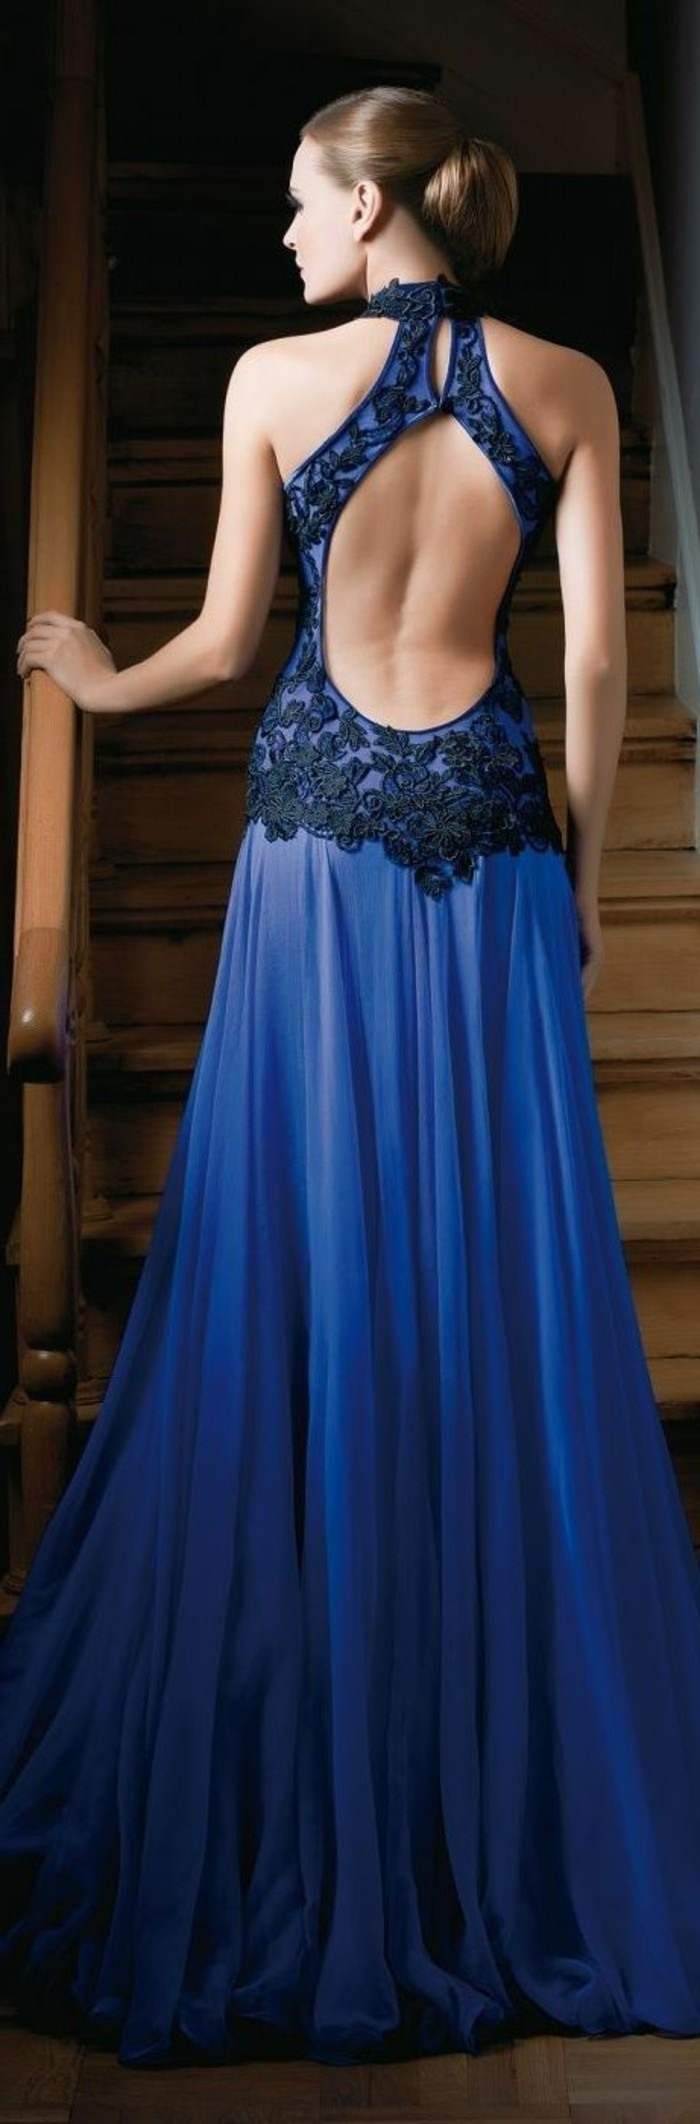 13 Top Elegante Kleider Blau GalerieDesigner Coolste Elegante Kleider Blau Design